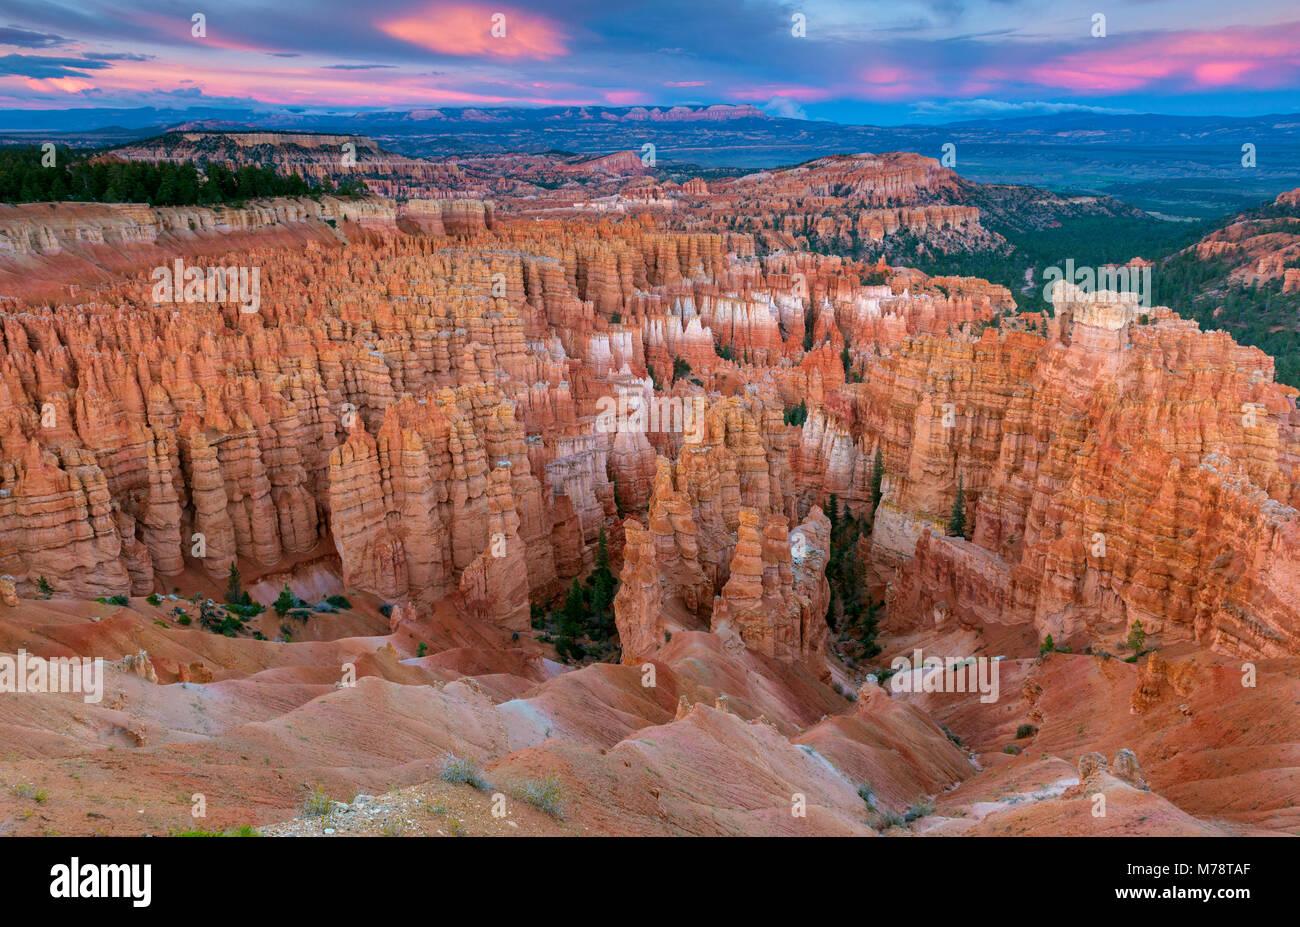 Al anochecer, Wall Street, Bryce Canyon National Park, Utah Imagen De Stock